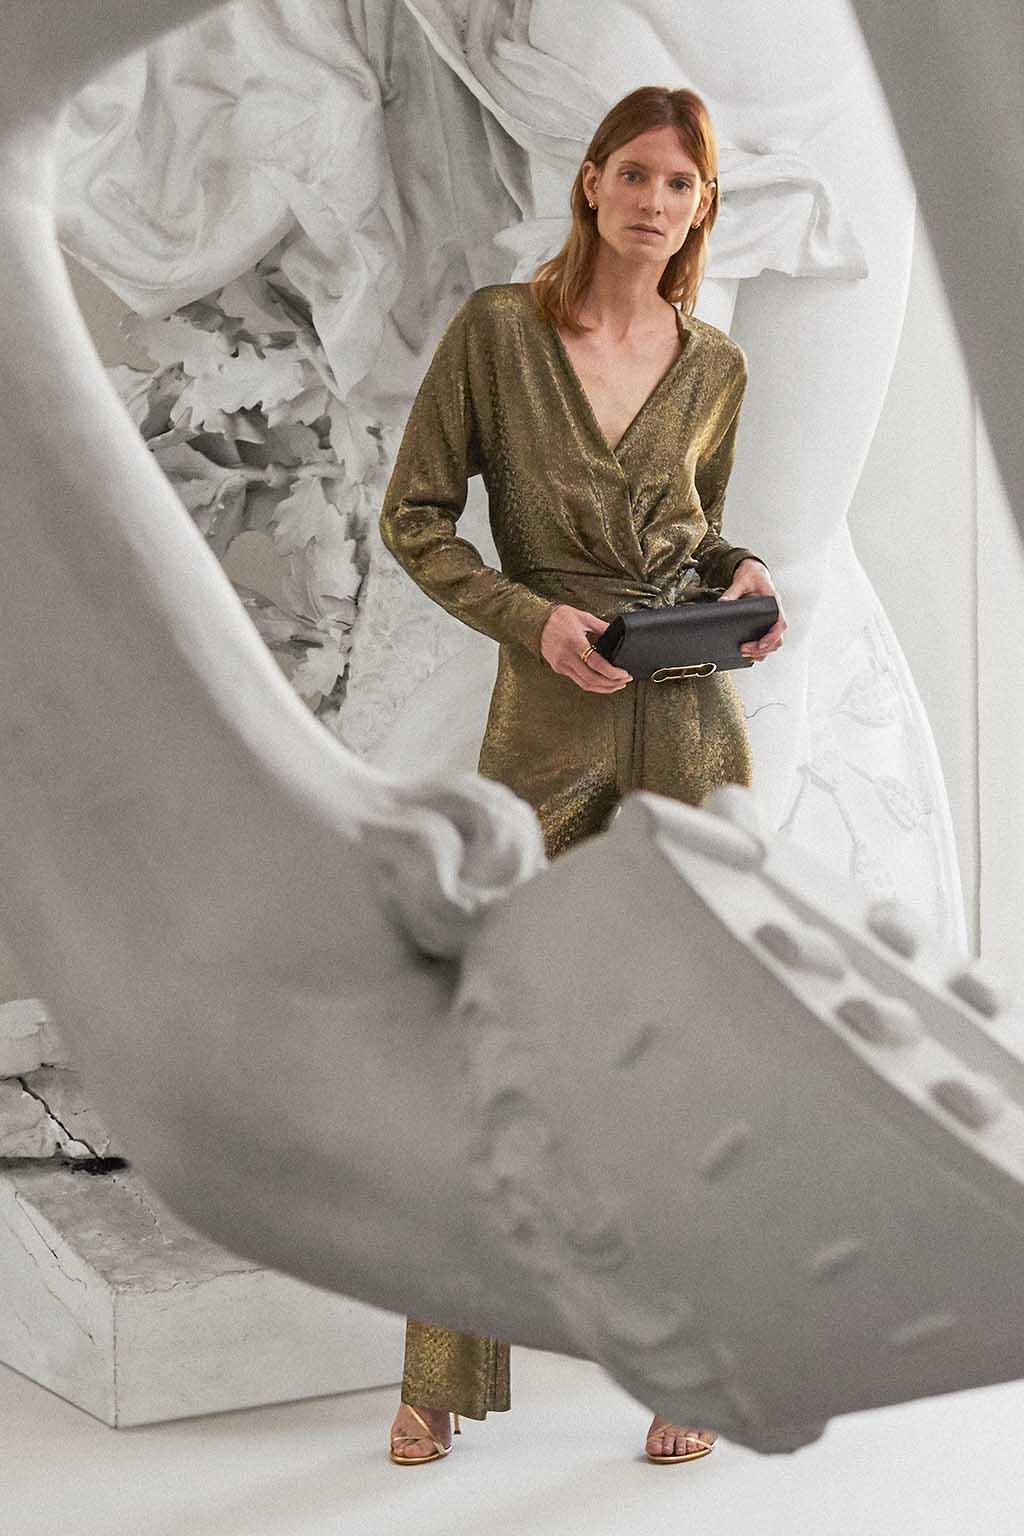 CH Carolina Herrera. New Womenswear Collection Evening. Look 16